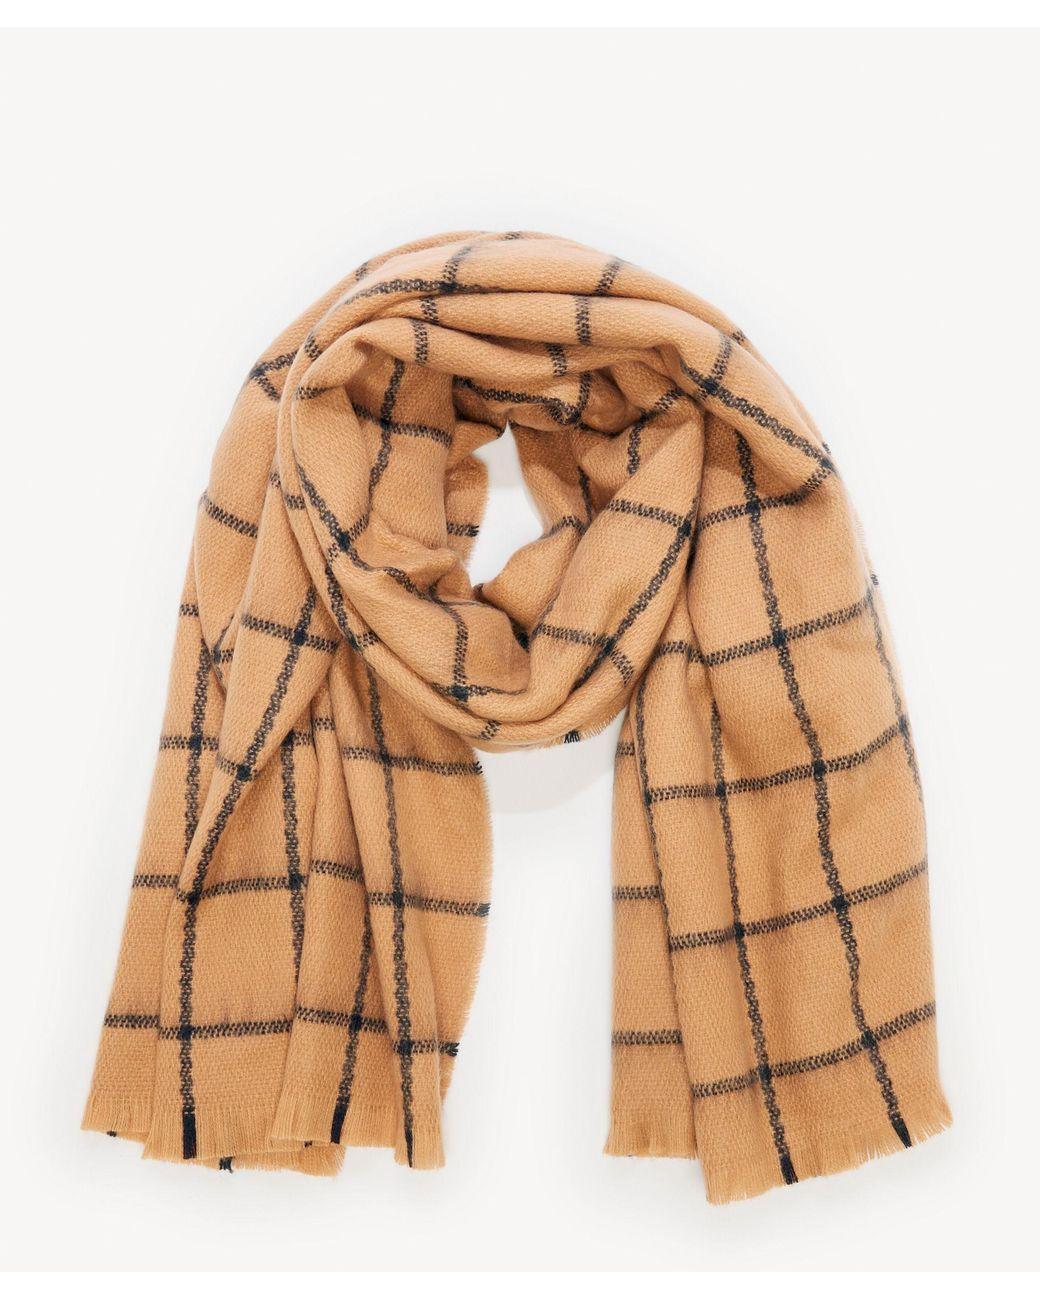 NEW Mid weight Plaid Square Scarf w// lurex Blue Cozy Wrap shawl UNISEX Warm